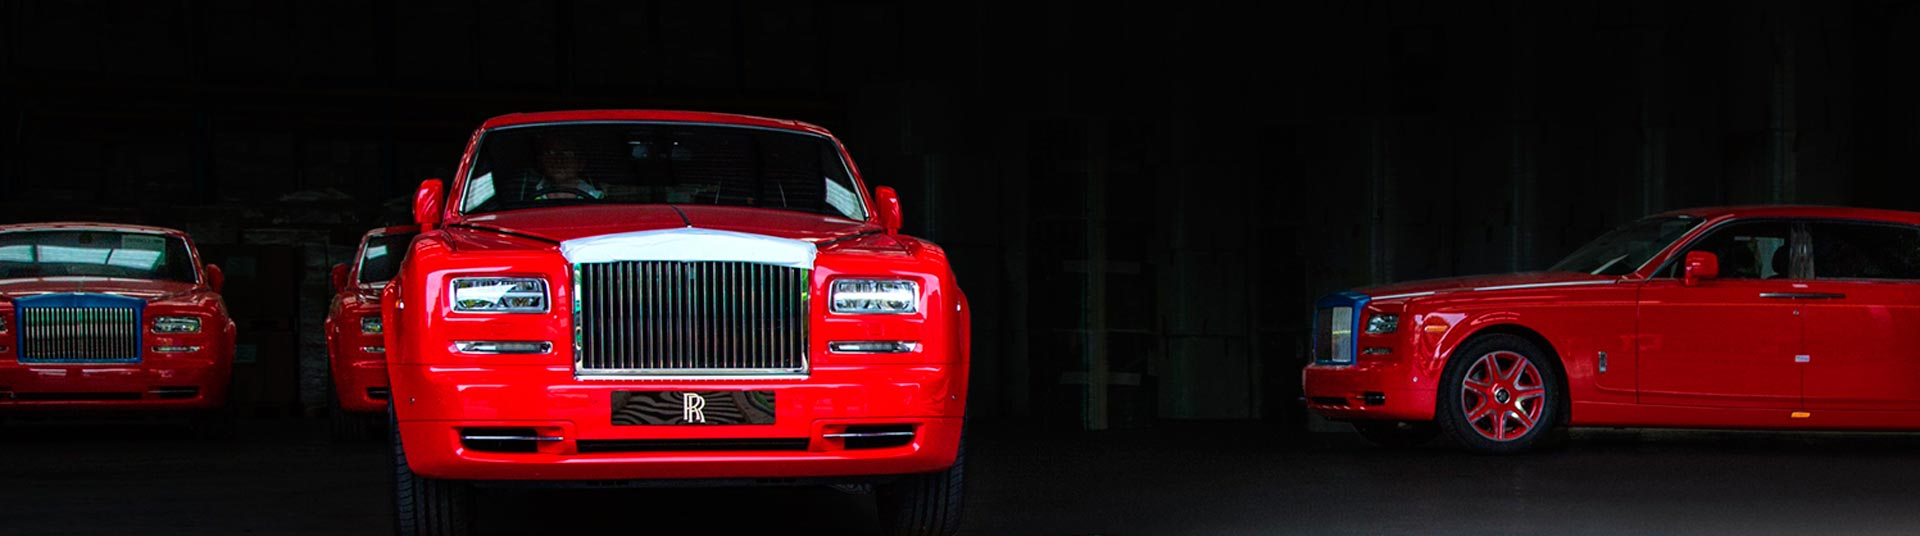 Rolls Royce Stephen Hung